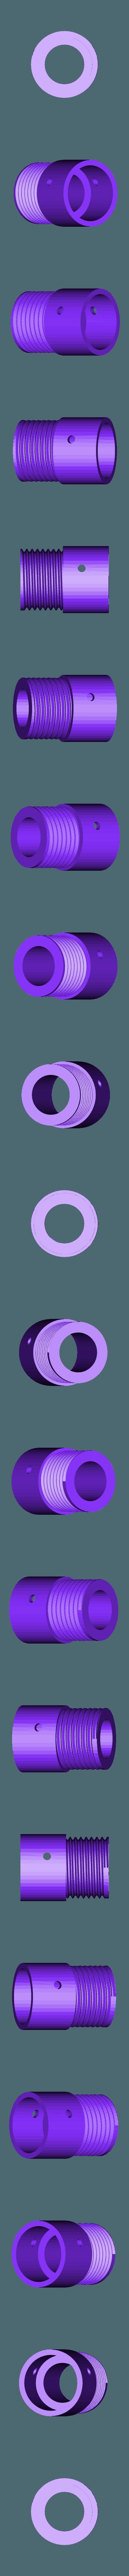 interfaceV2.STL Download free STL file Brush adapter • 3D print design, tart0uille